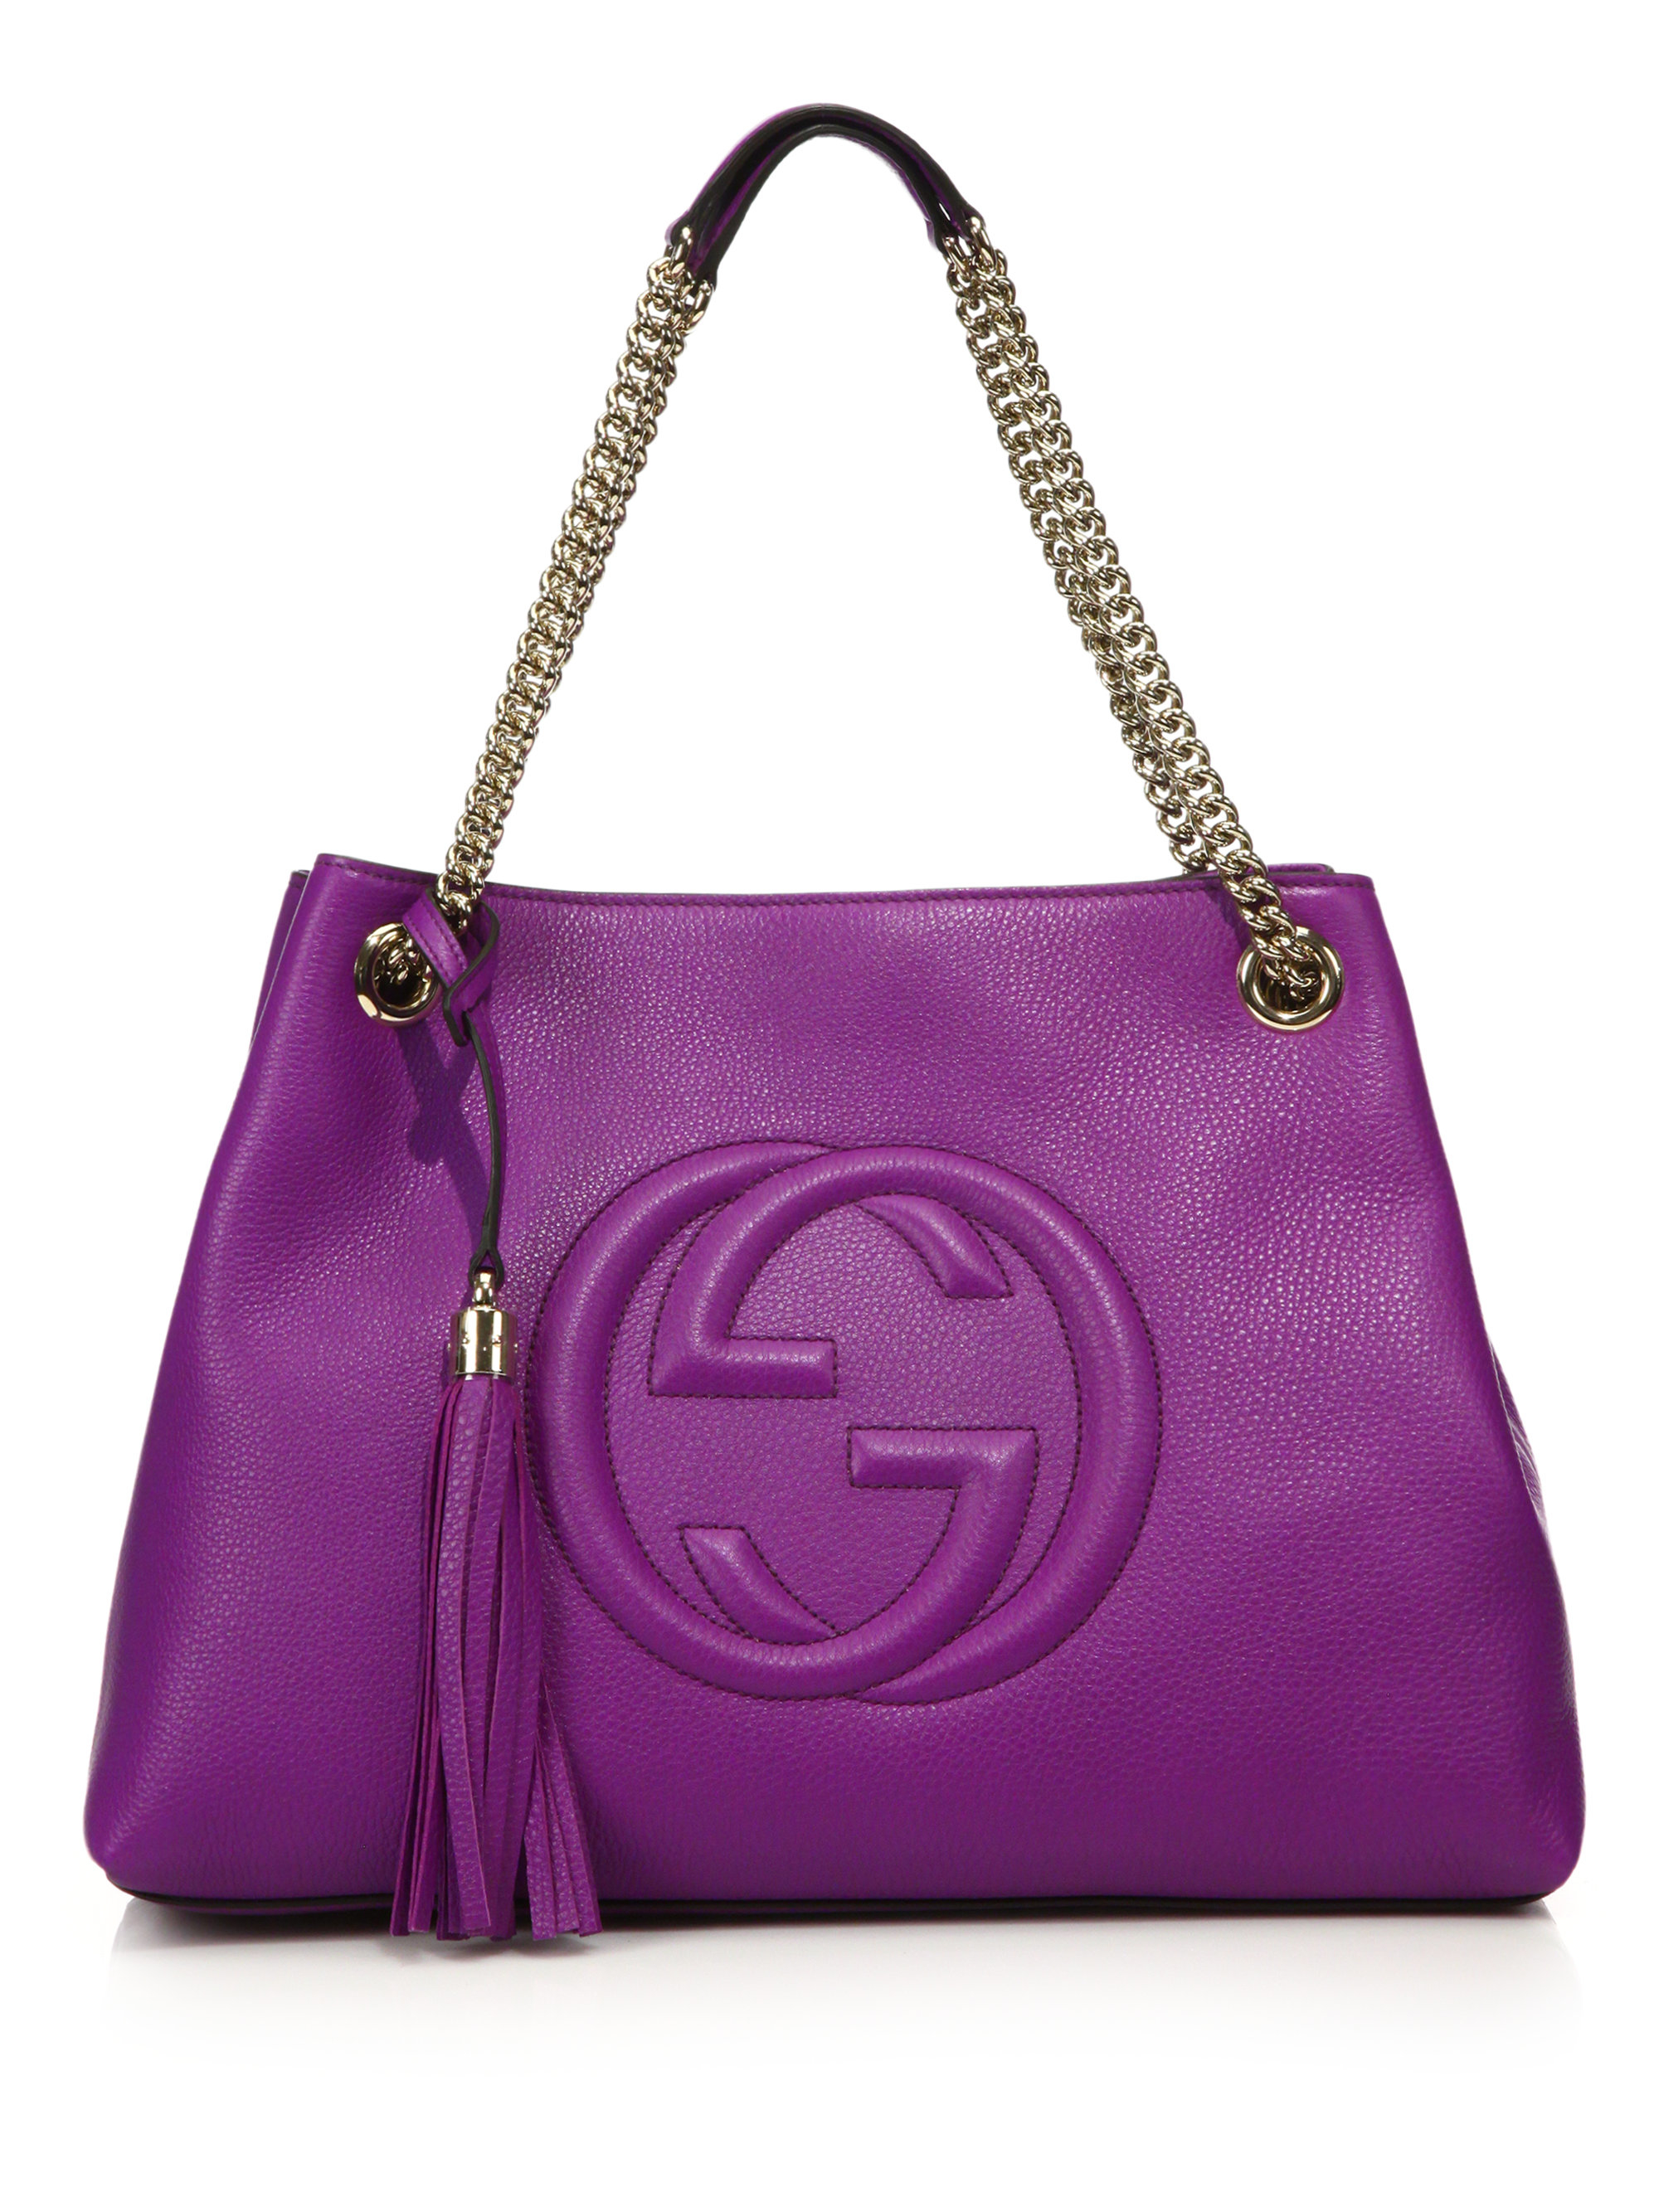 Lyst - Gucci Soho Leather Shoulder Bag in Purple 9126f636054e6